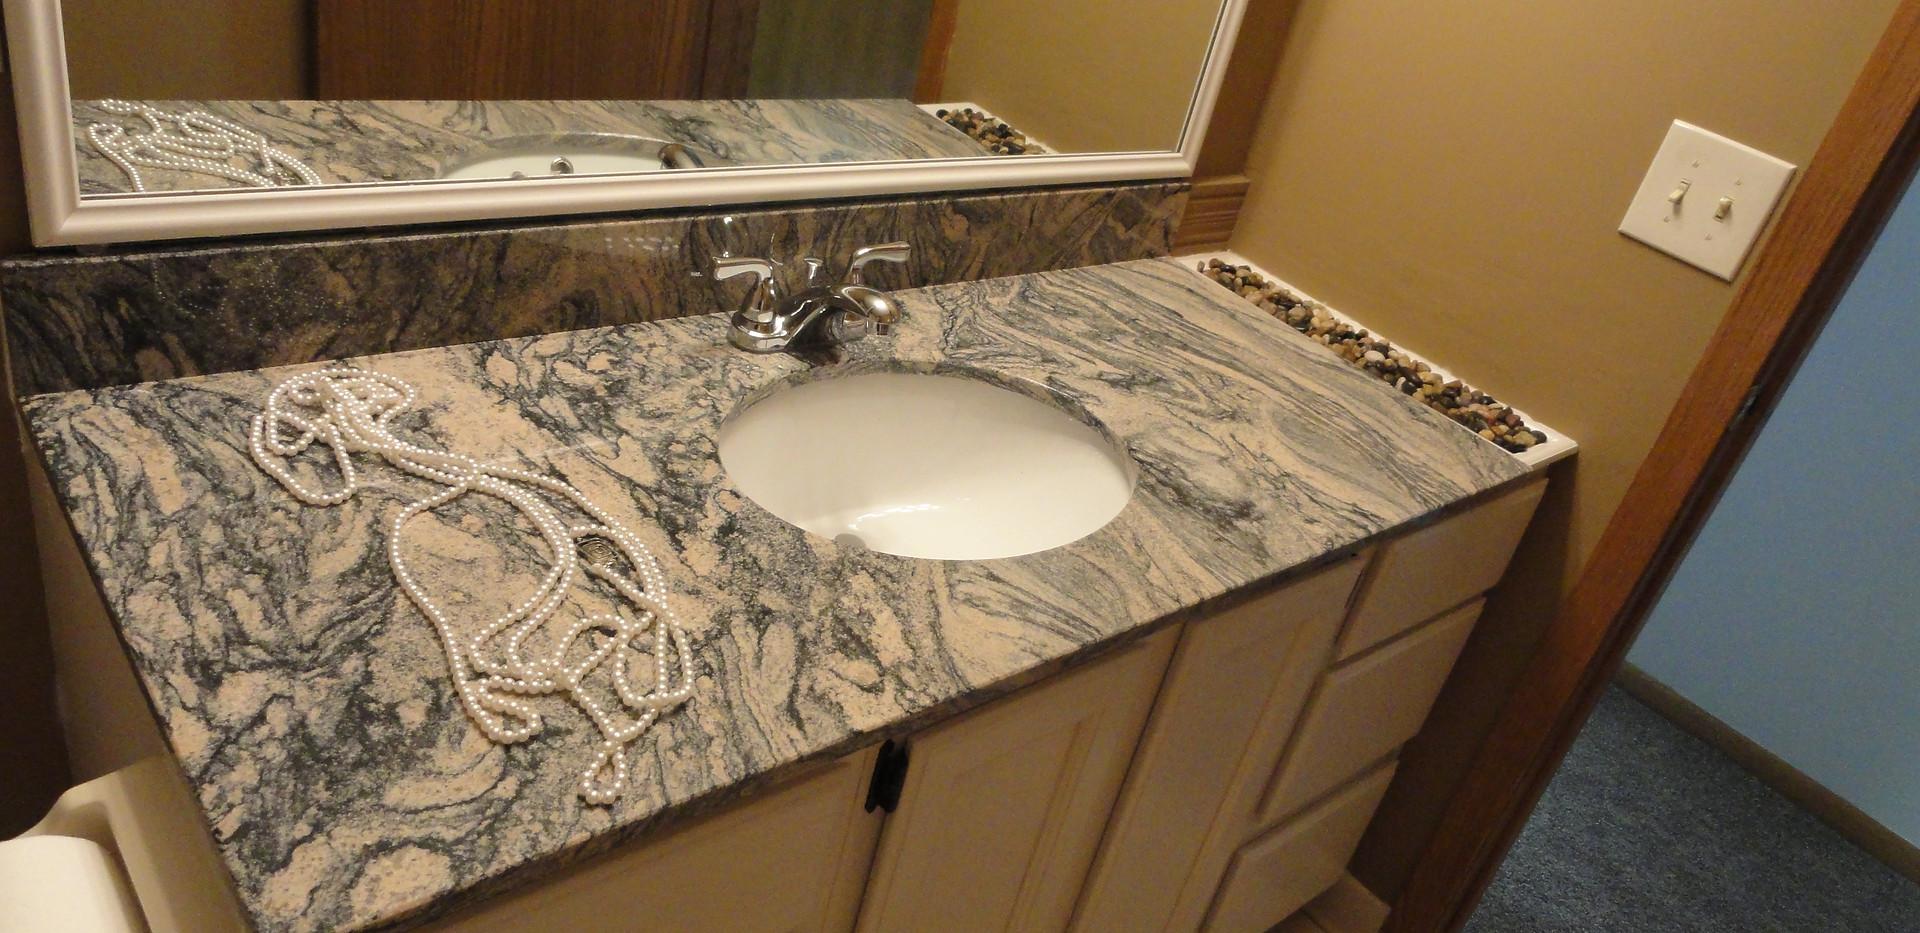 New Granite Counter Tops